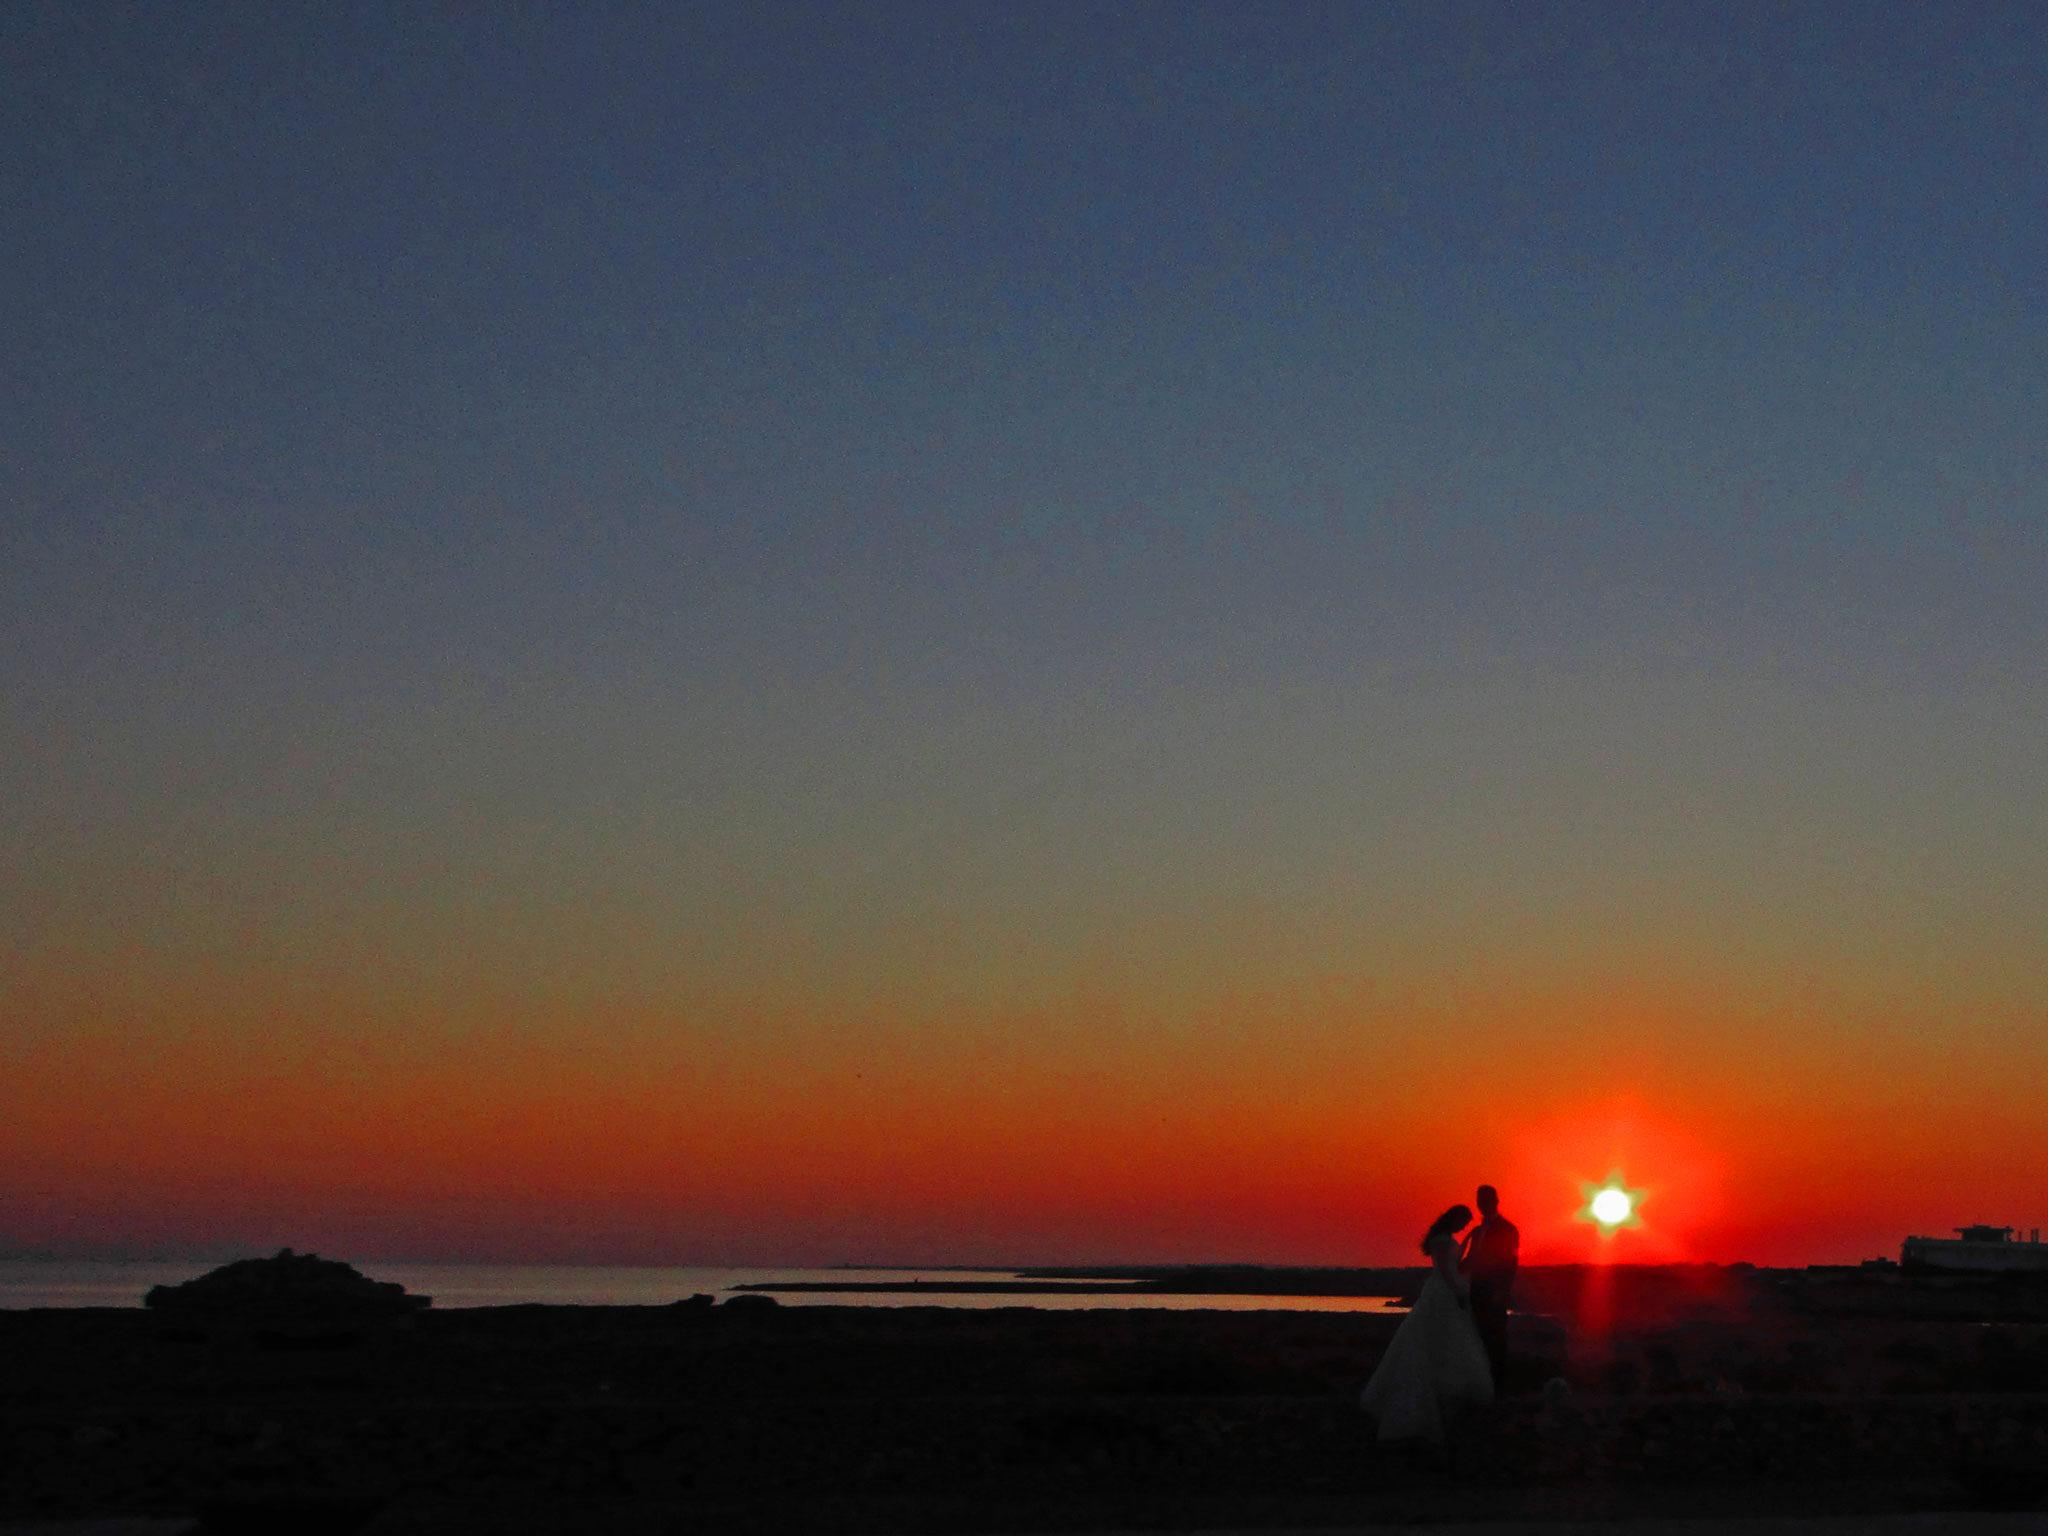 Red Sunset by garrisidaniele